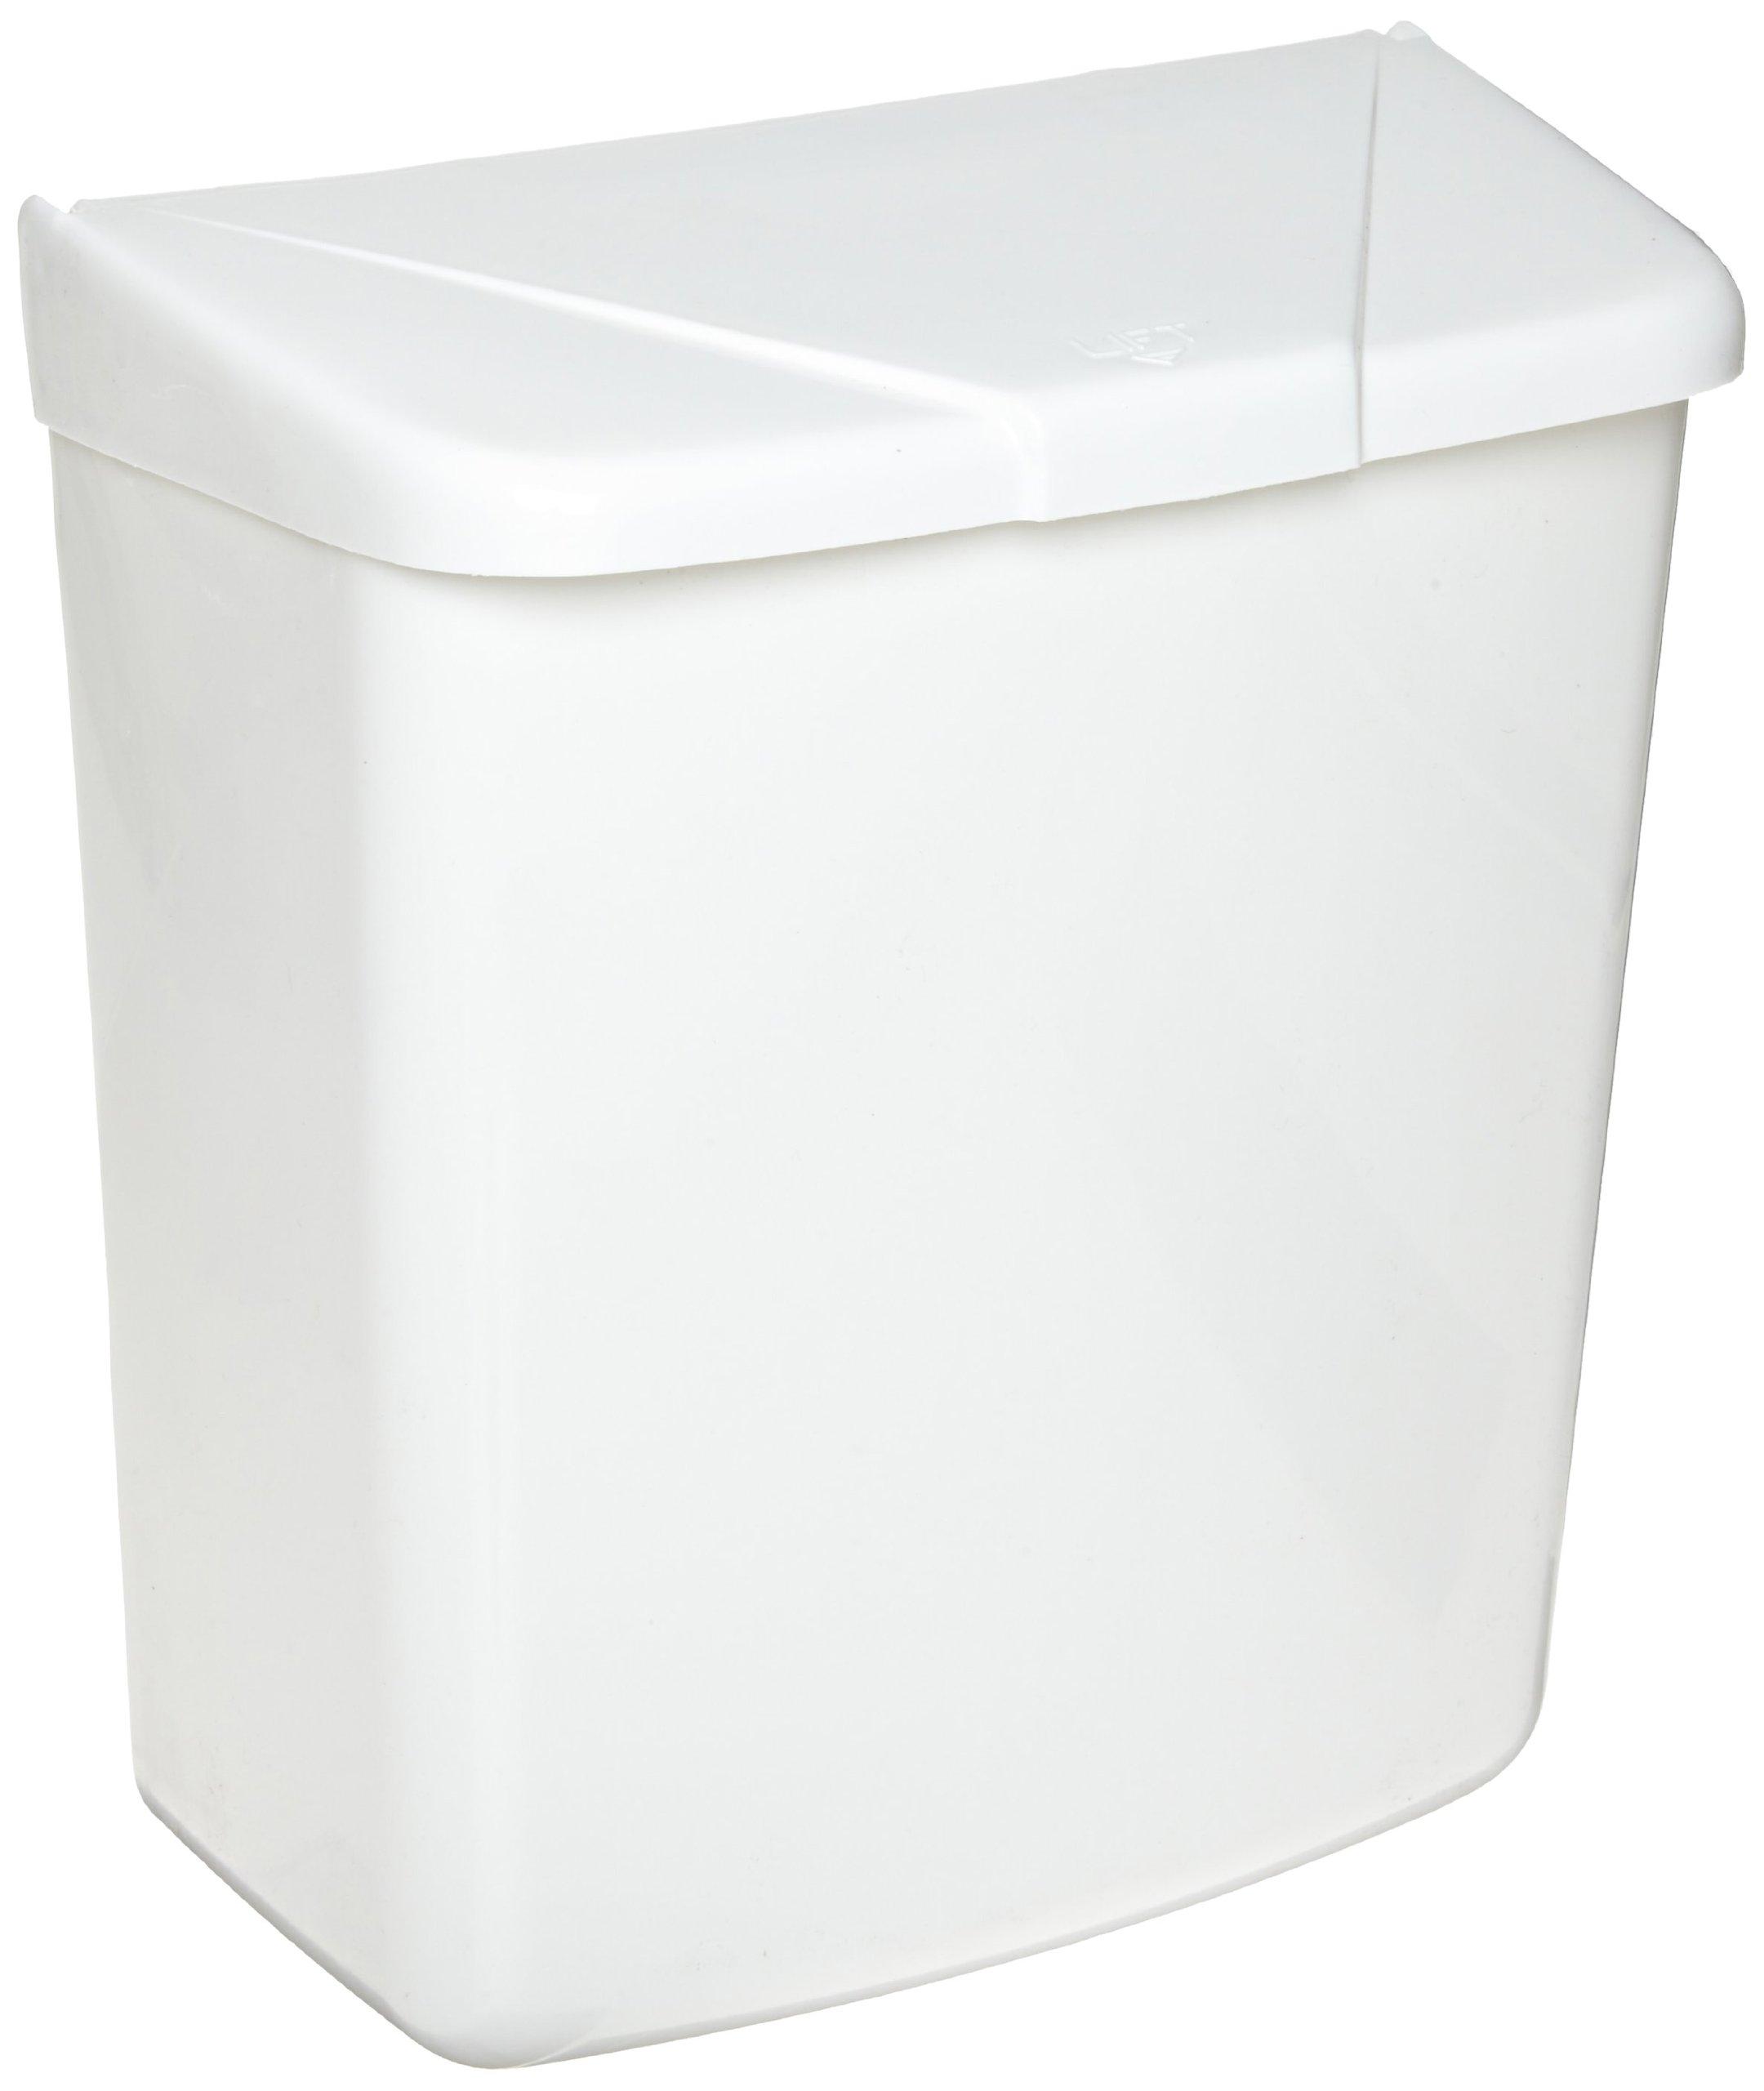 Hospeco Feminine Hygiene Receptacle, White ABS Plastic, 250-201W by Hospeco (Image #2)